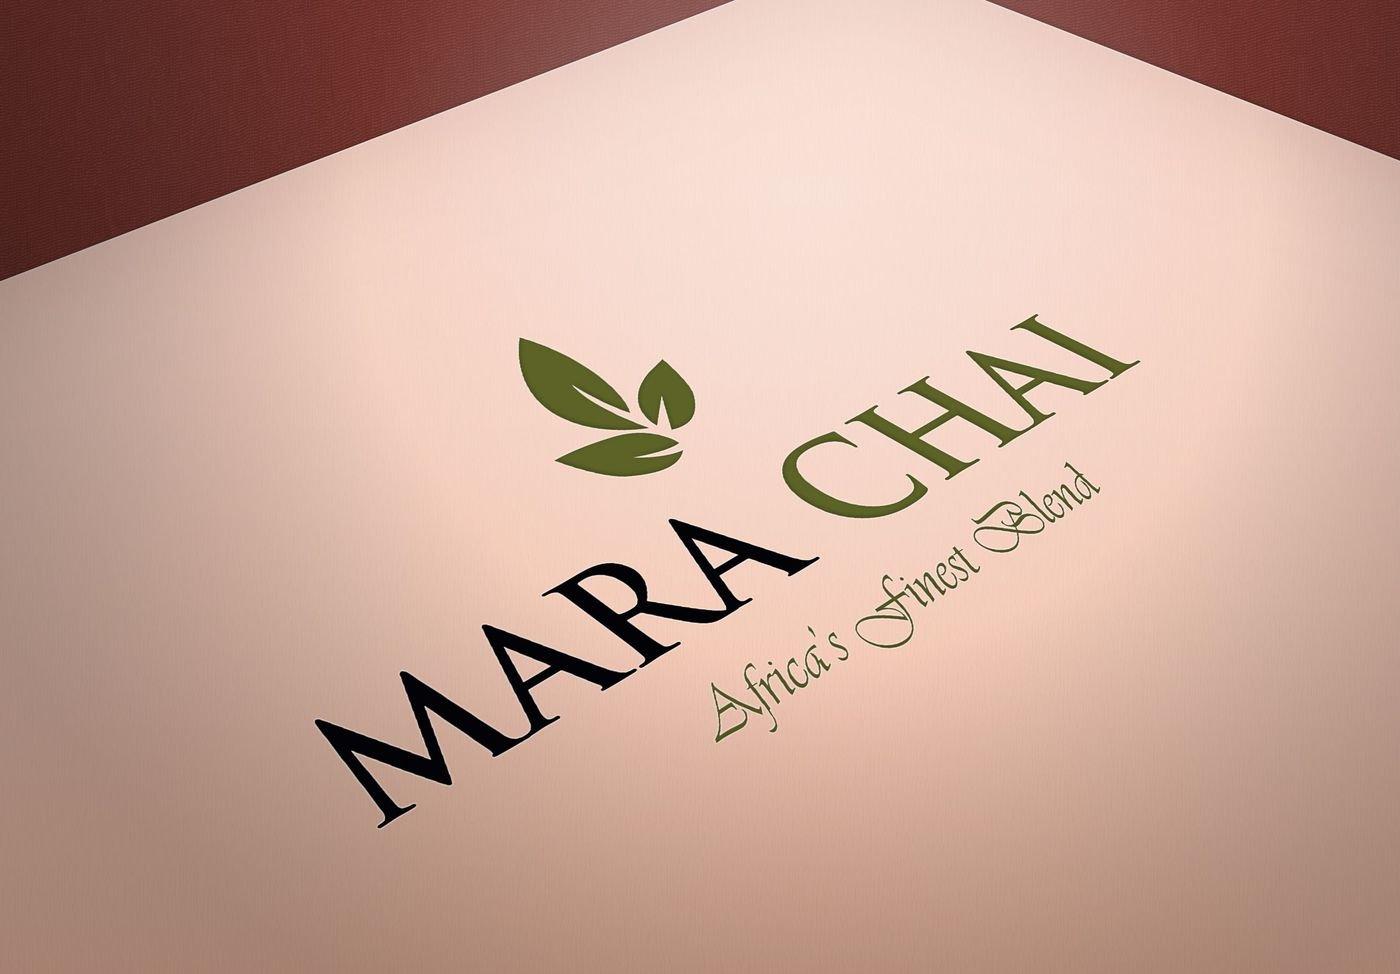 MARA CHAI LOGO by Rashid Dina at Coroflot.com.